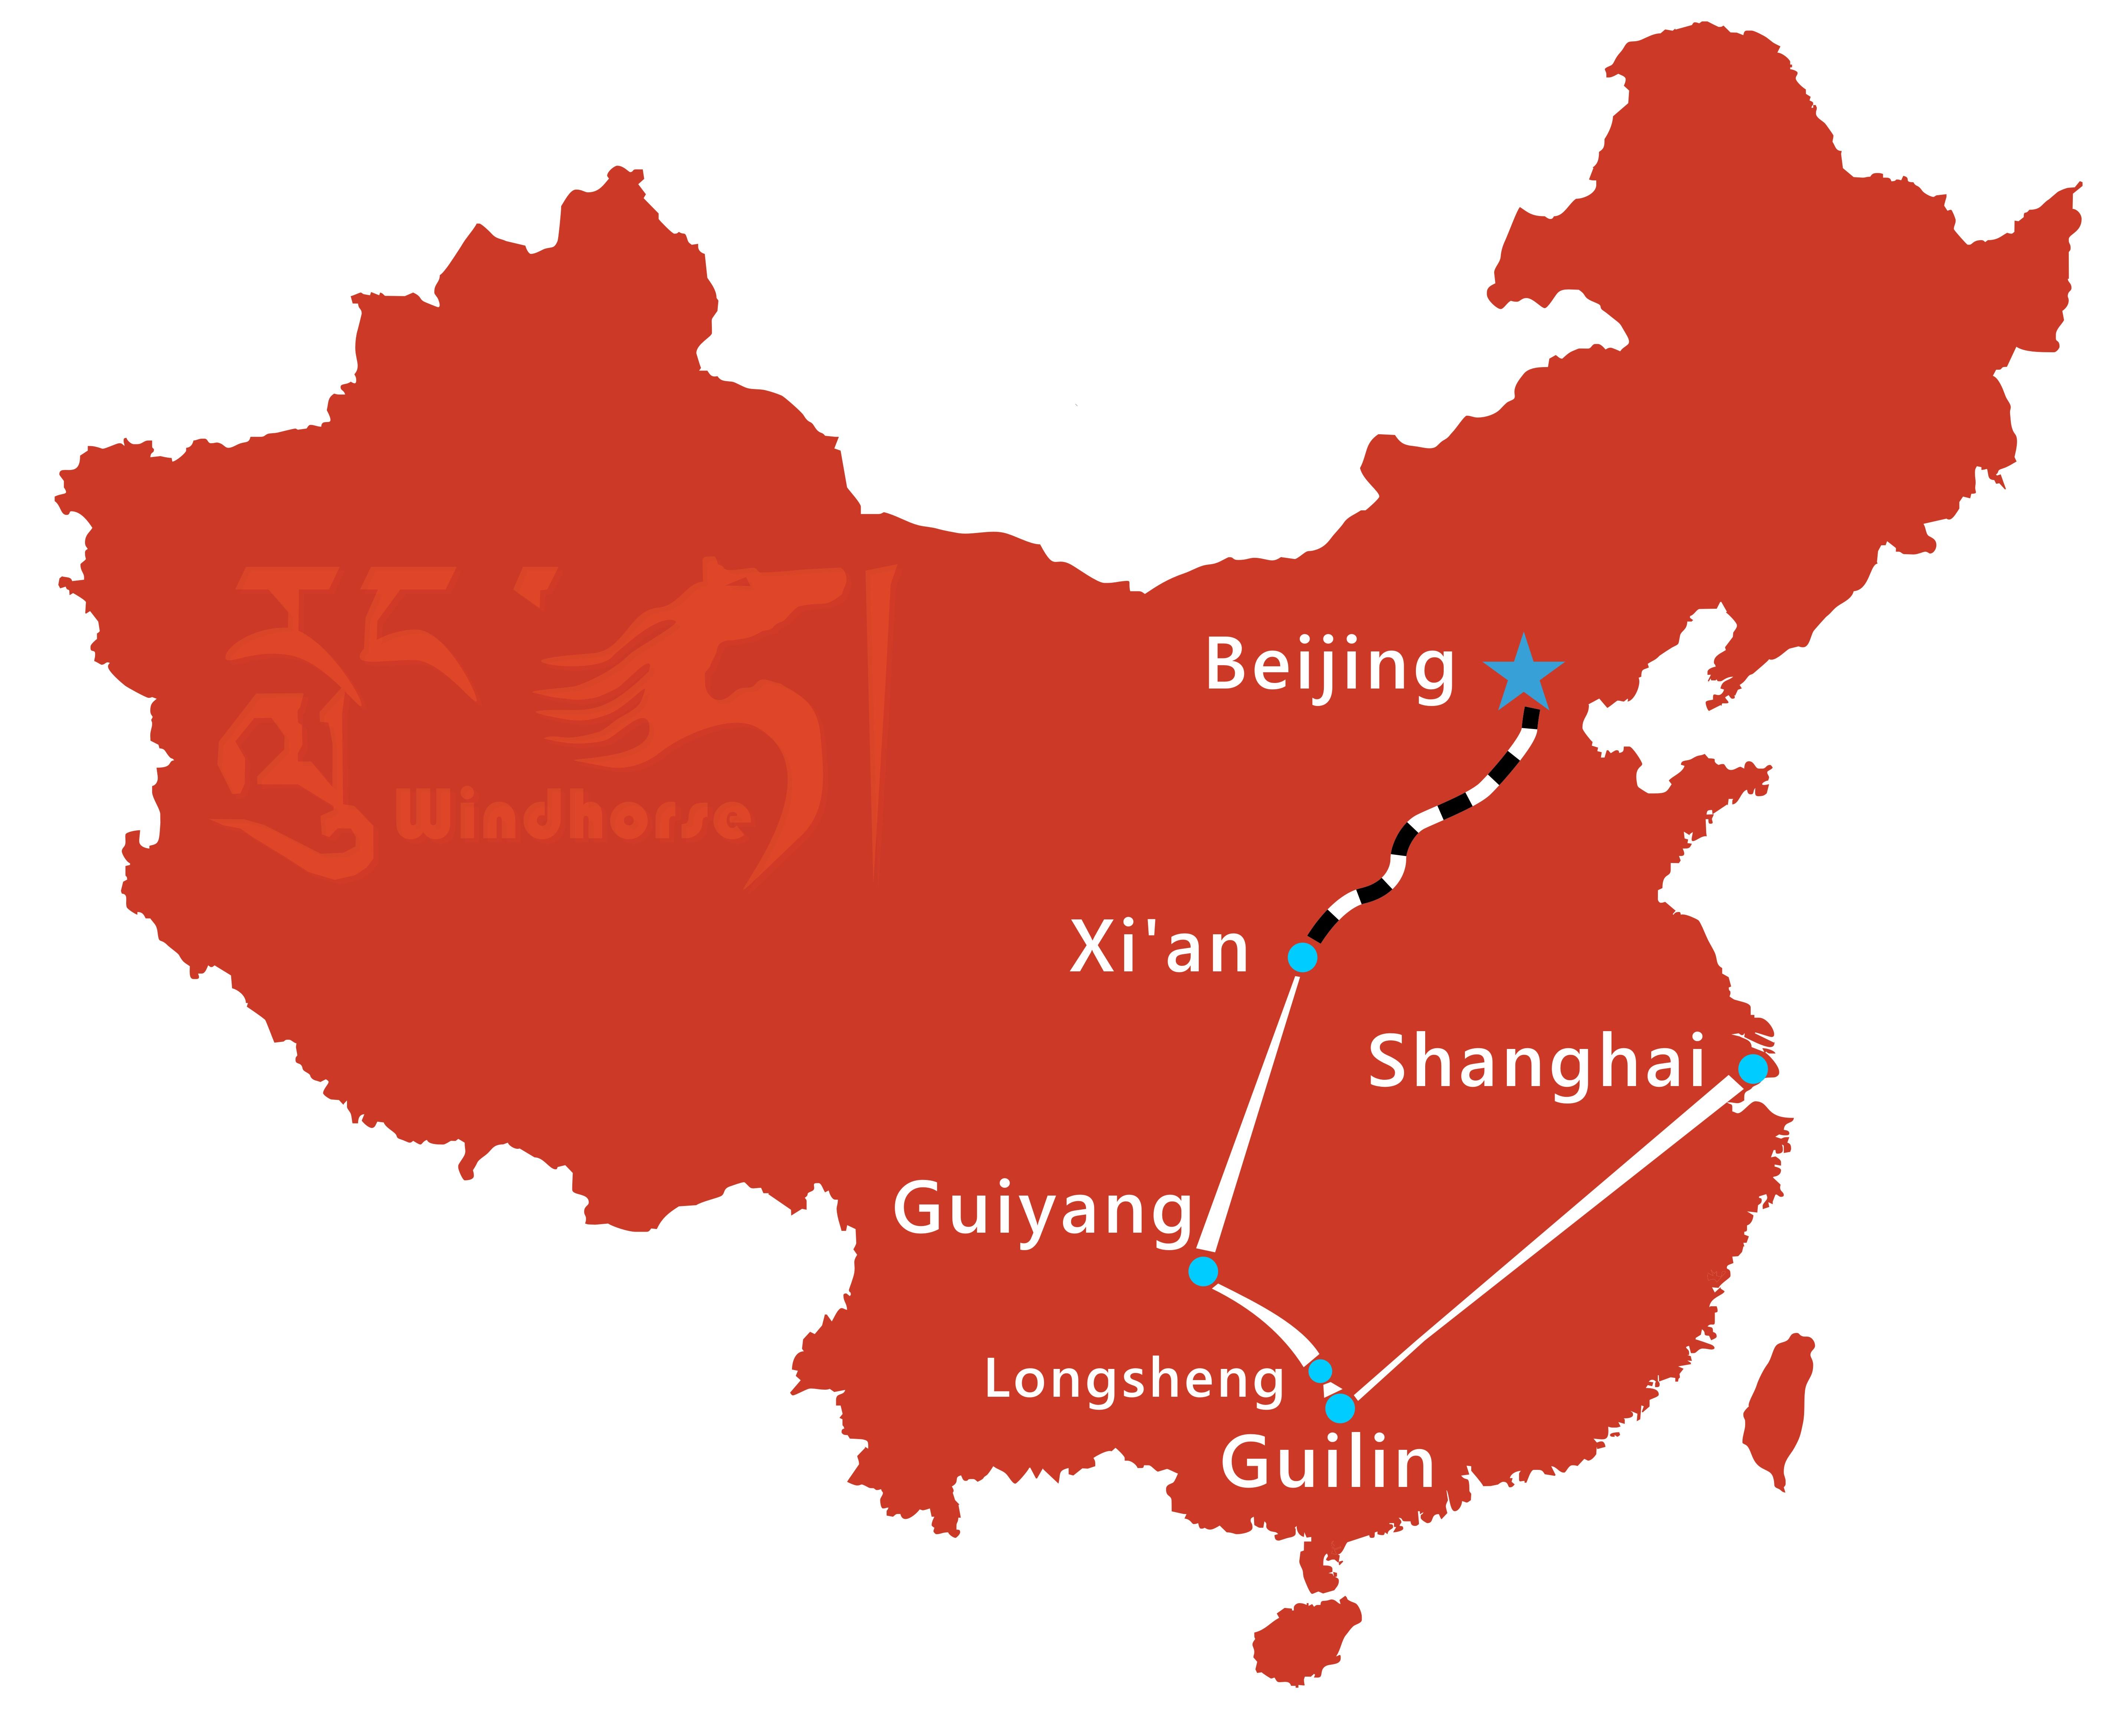 China Minority Tour Route